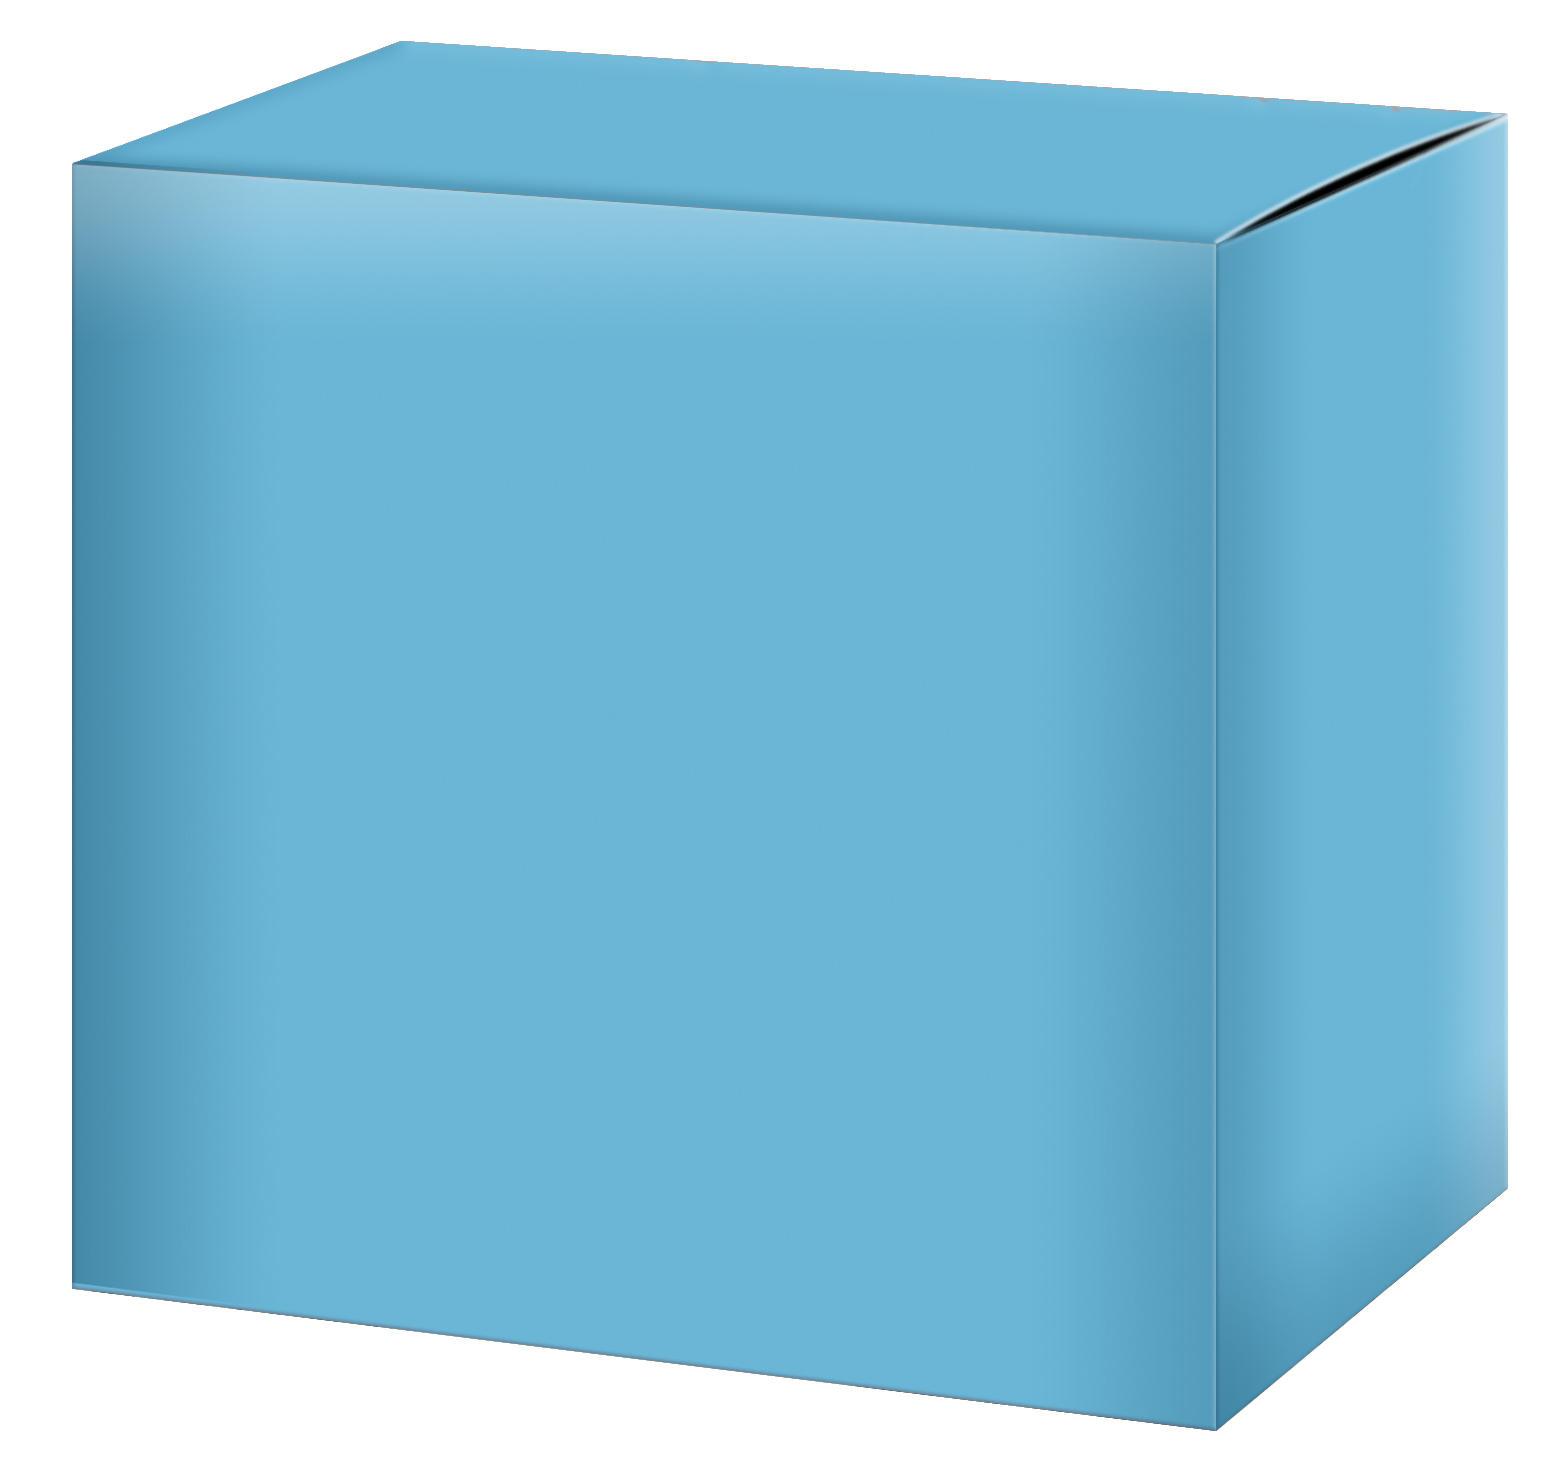 Box packing by RedDragonPhoenix on DeviantArt